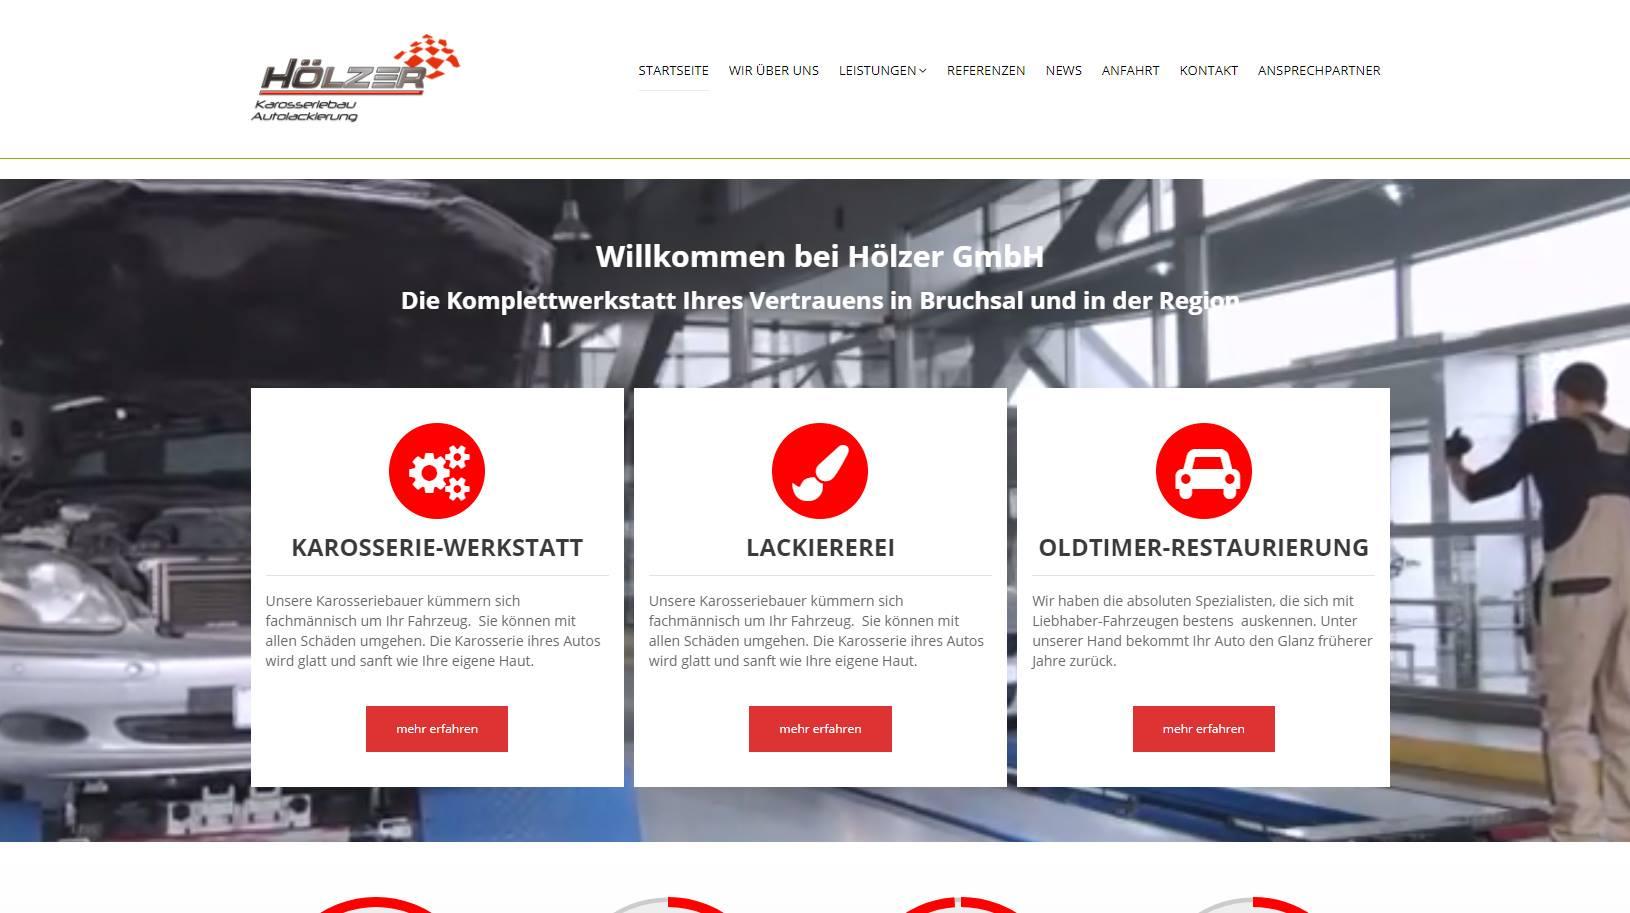 Hölzer GmbH